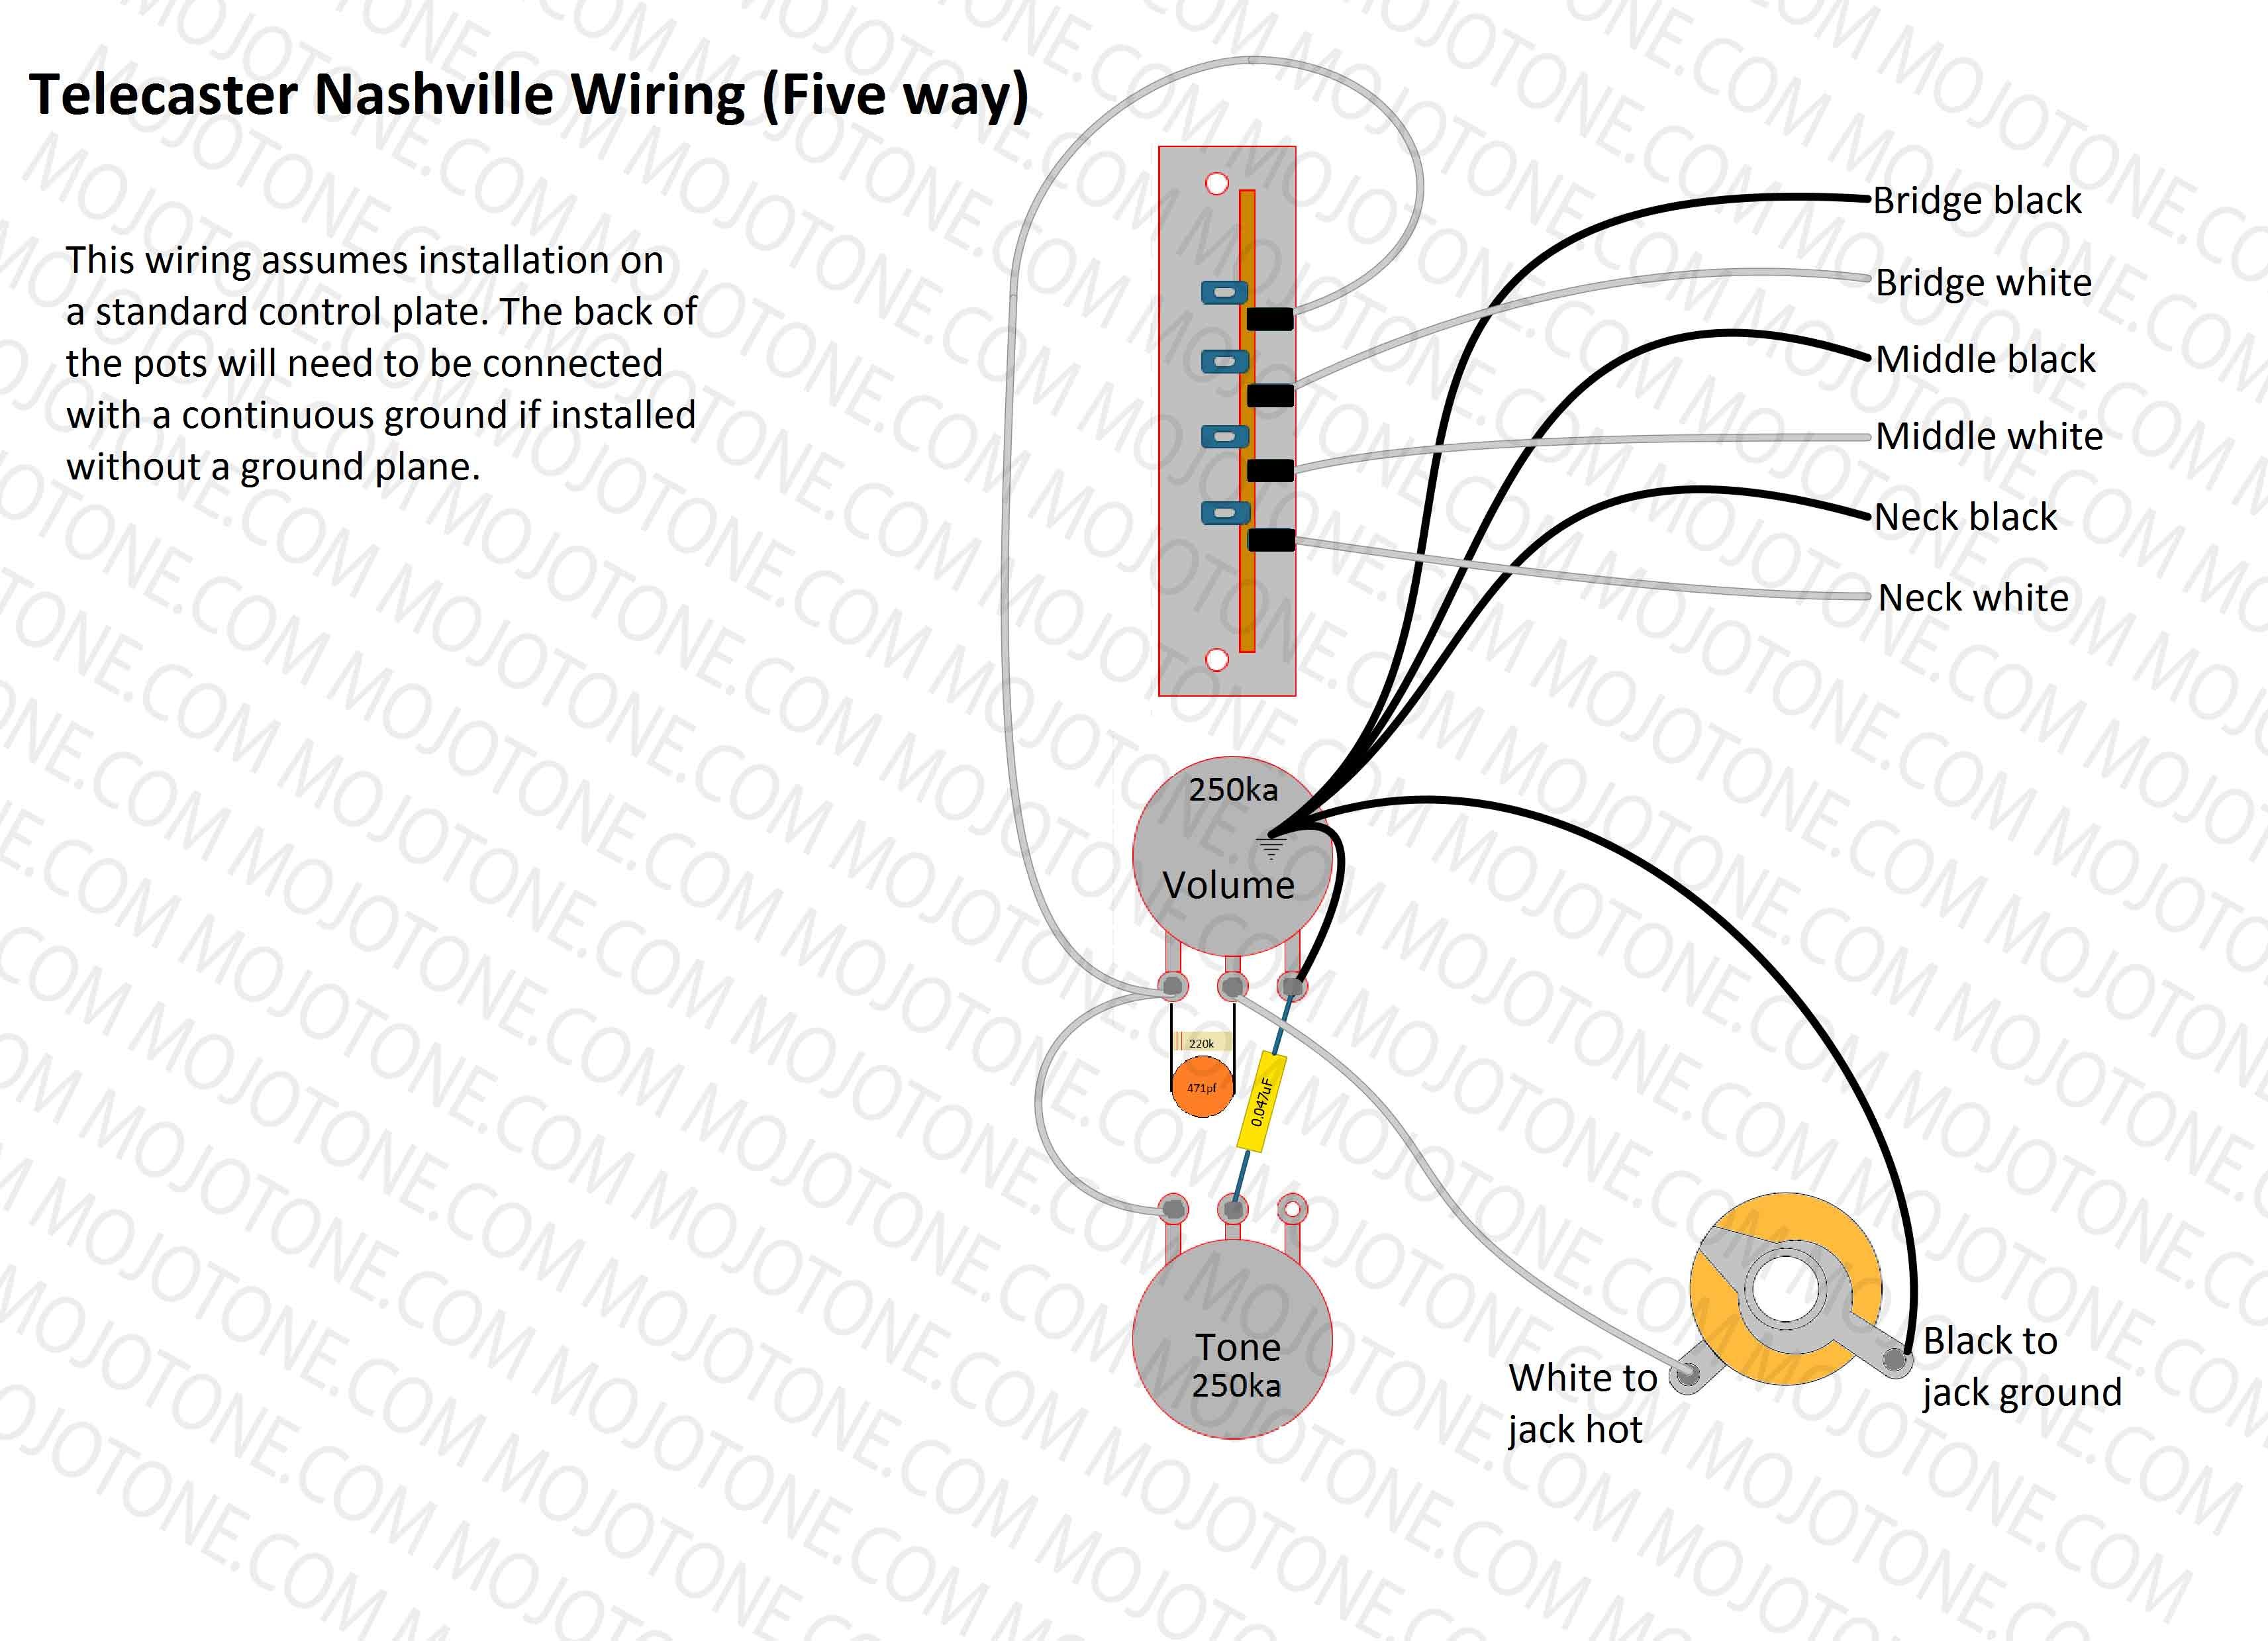 Telecaster Nashville Wiring Diagram - Telecaster Wiring Diagram